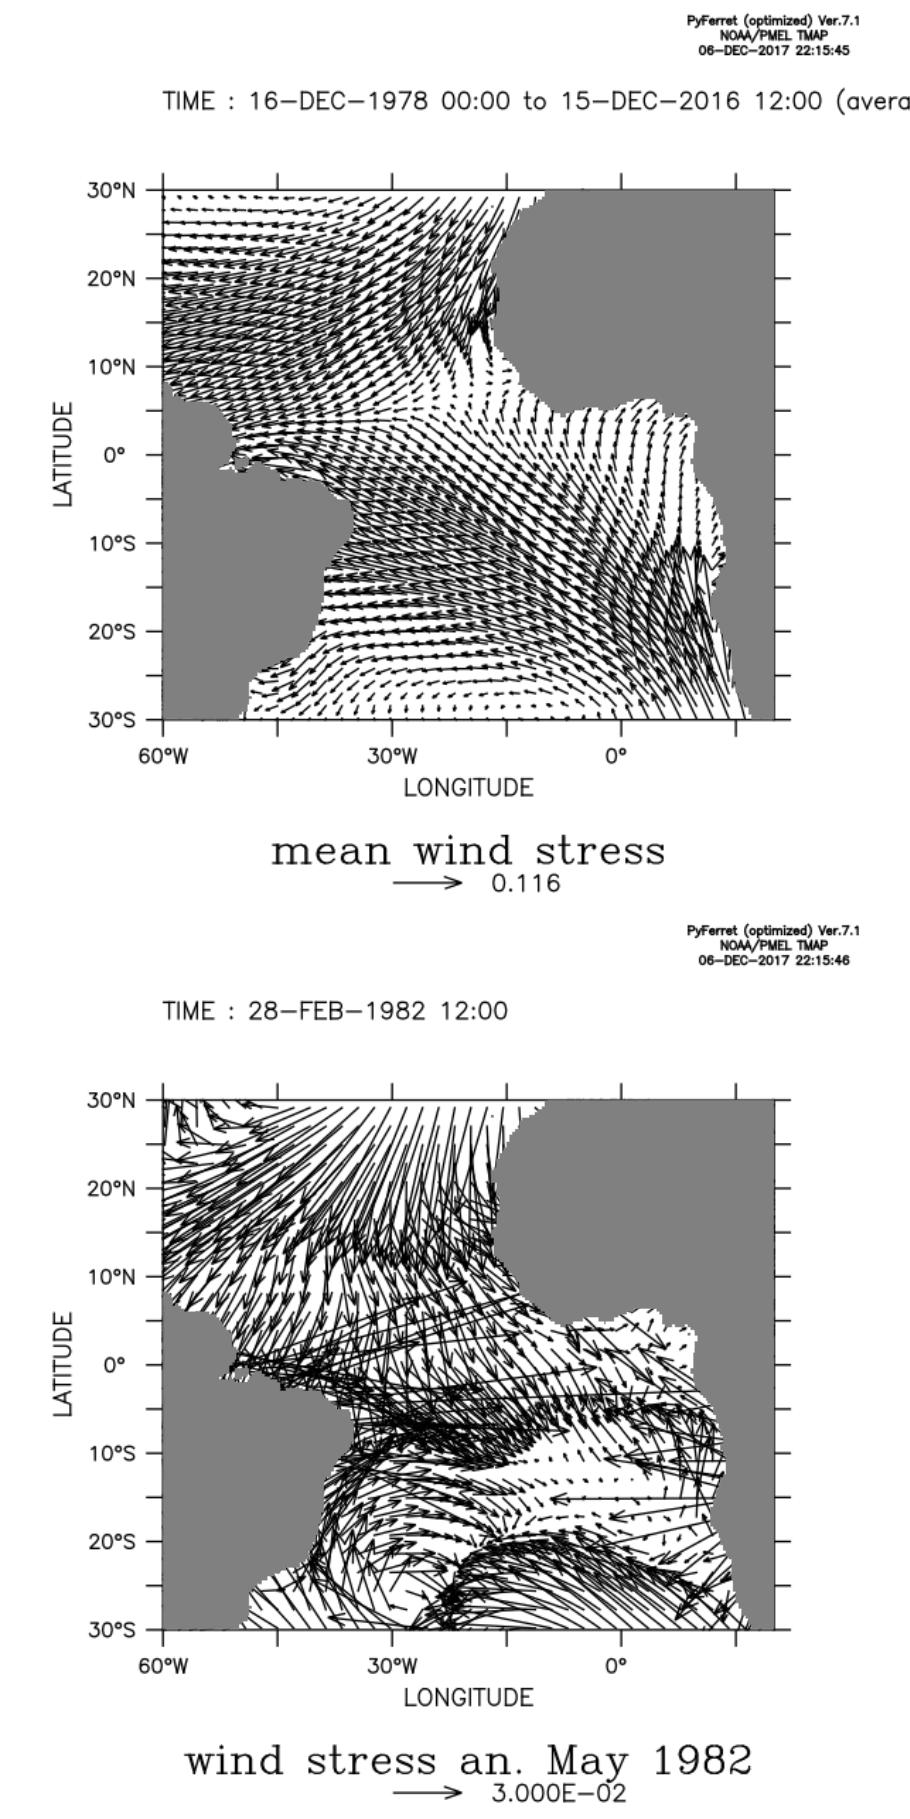 example_08_ERAIN_SFC12_MM_deseasoned_Tropical_Atlantic_wind_stress.png